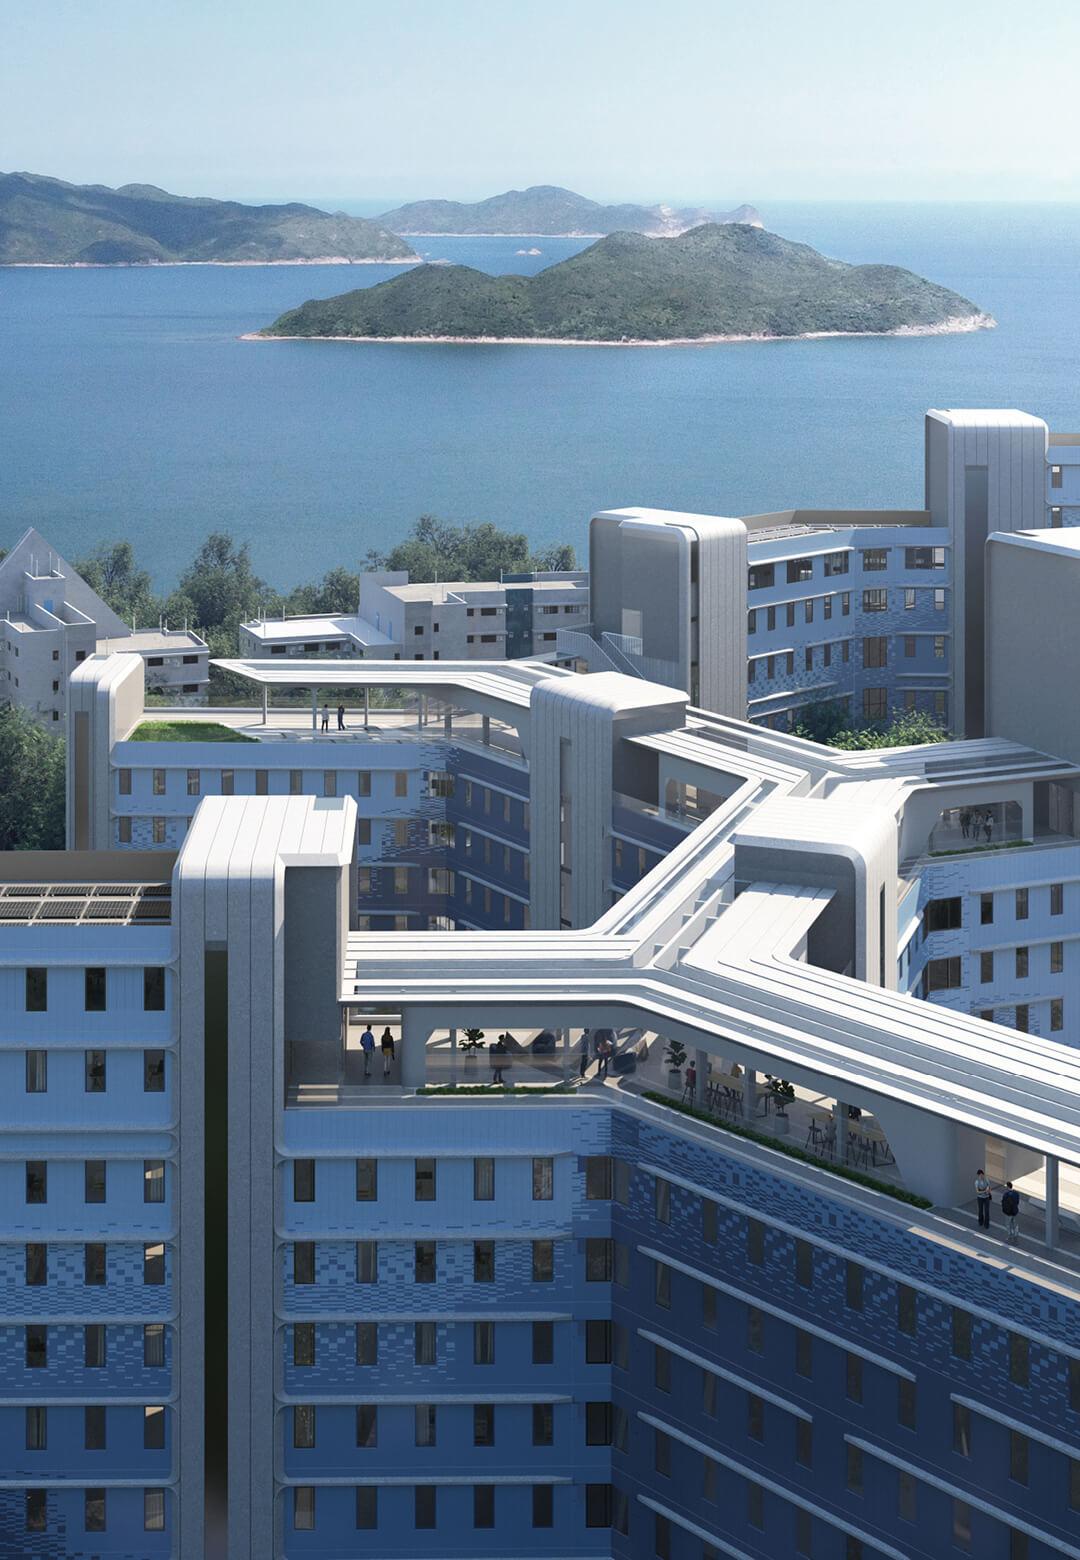 Roofline at the New halls of residence  |New halls of residence designed by Zaha Hadid Architects | STIRworld